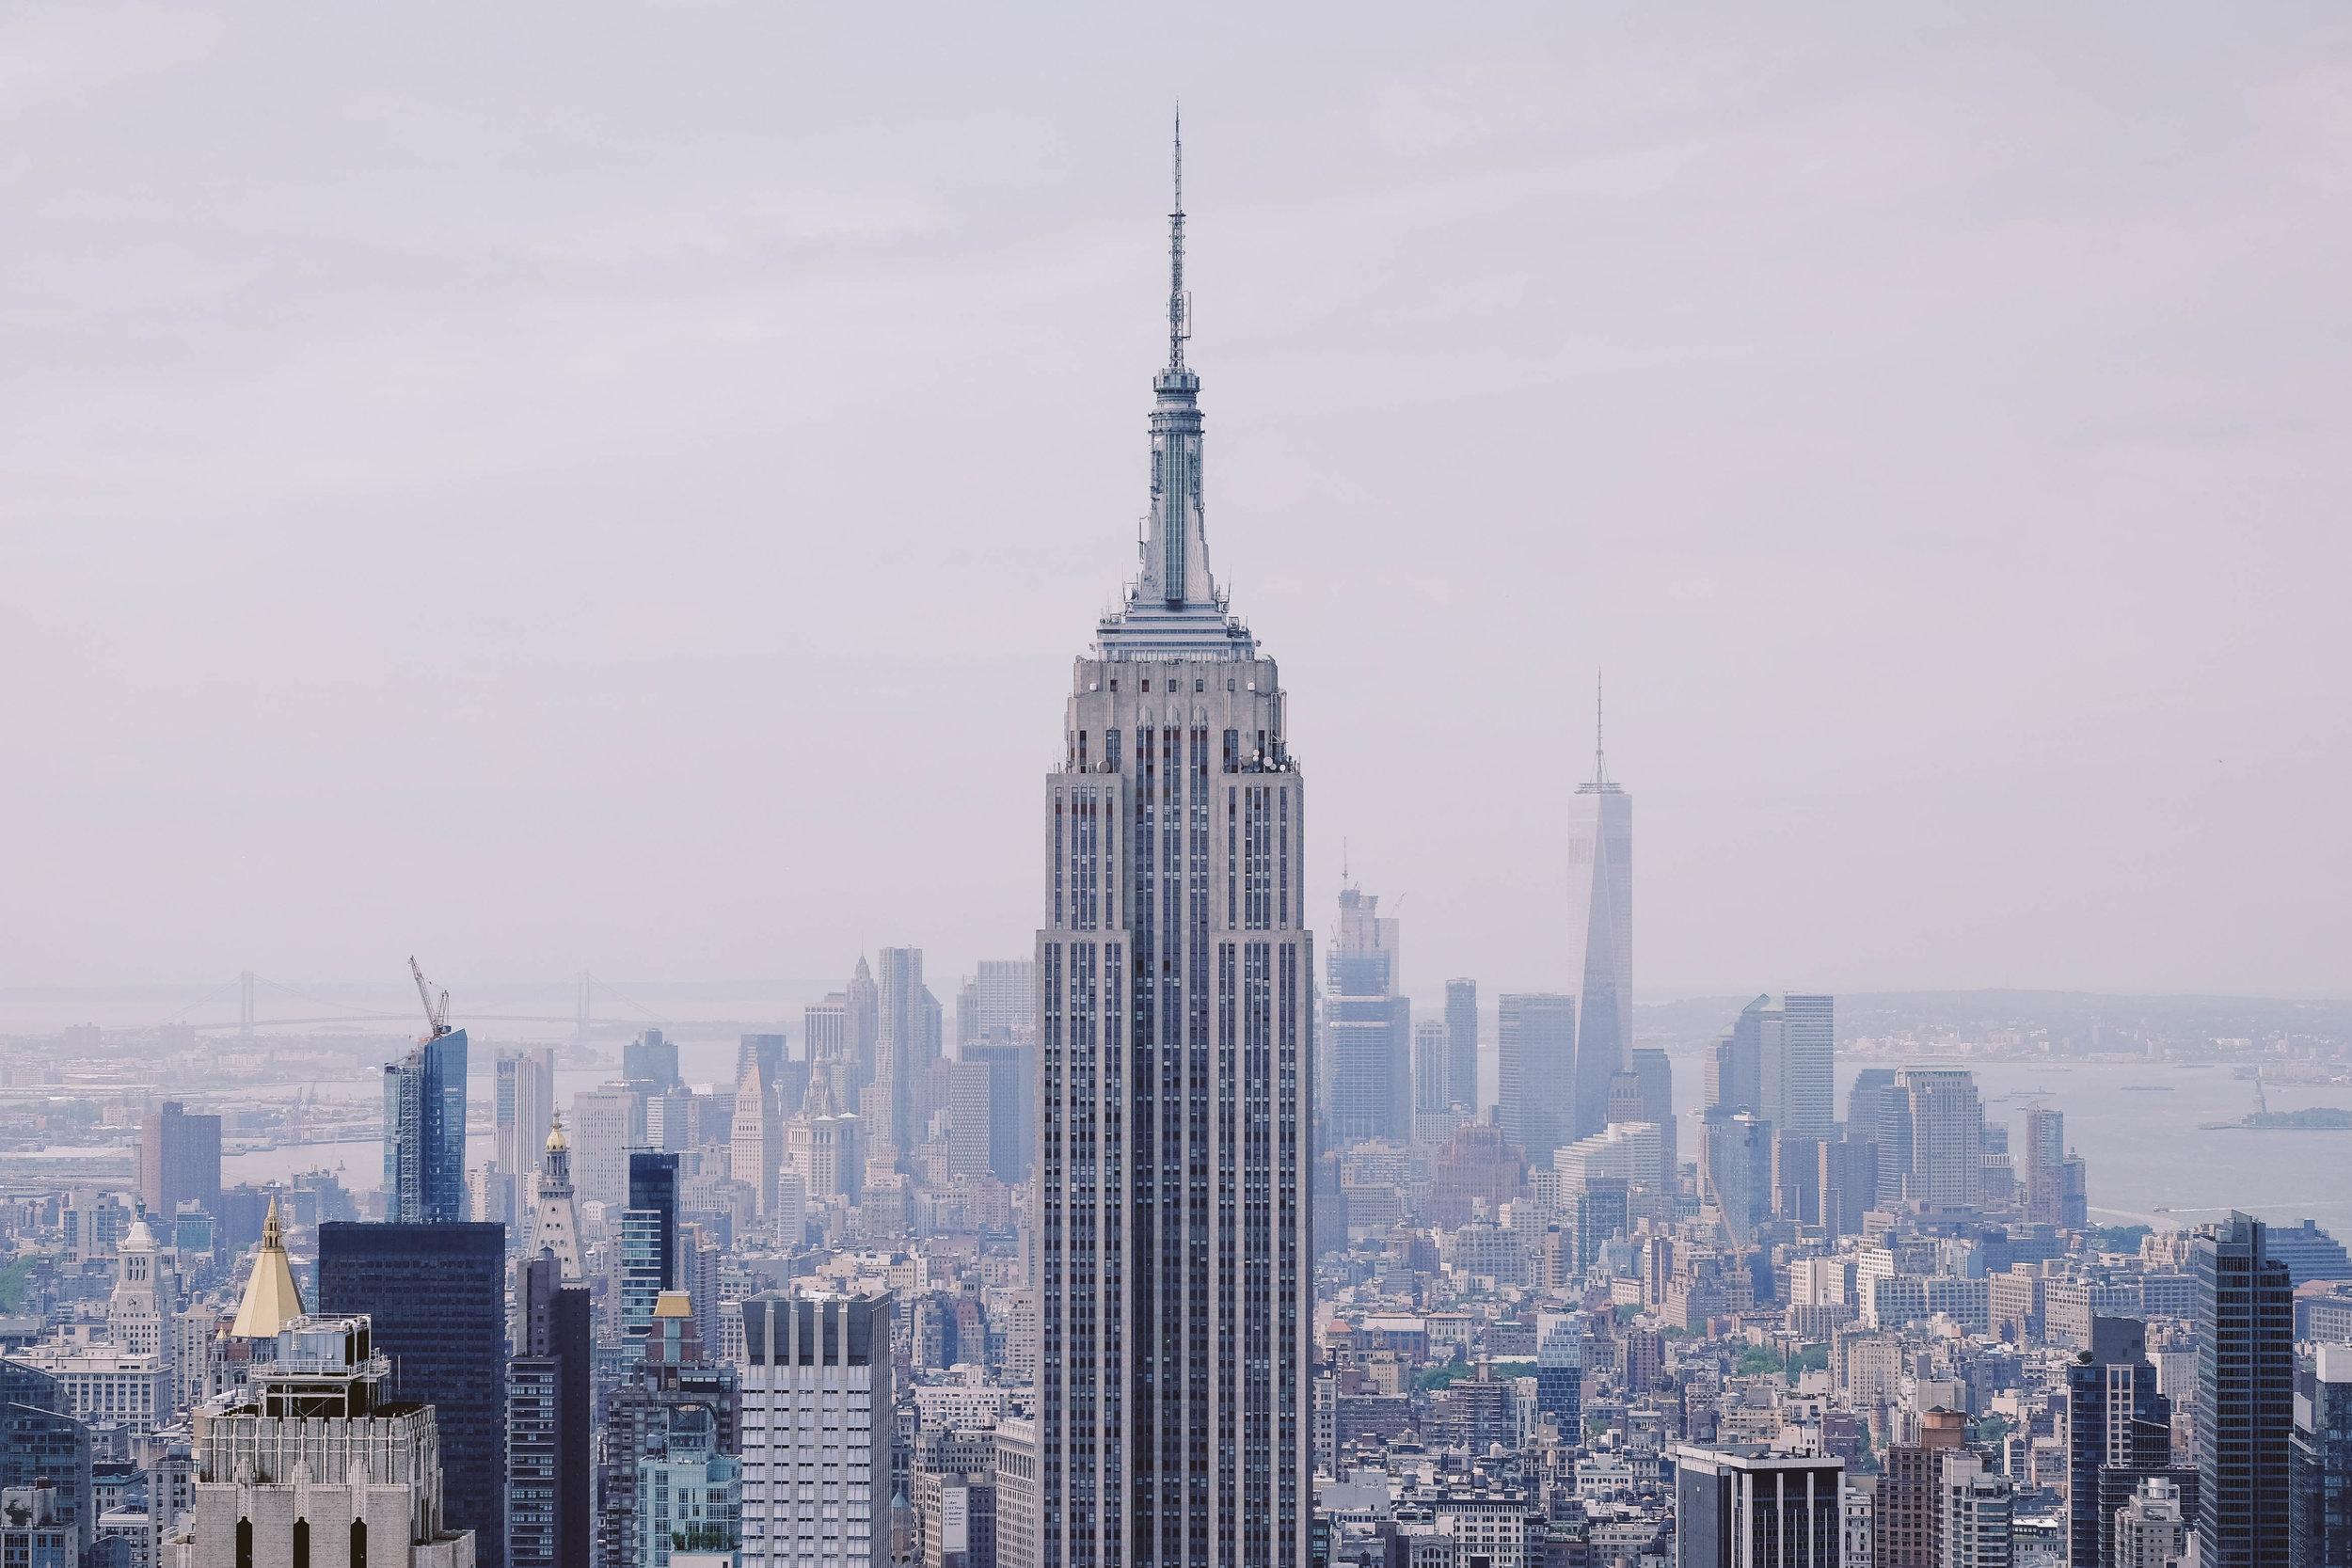 New York - Employee Engagement Awards: June 20, 2019